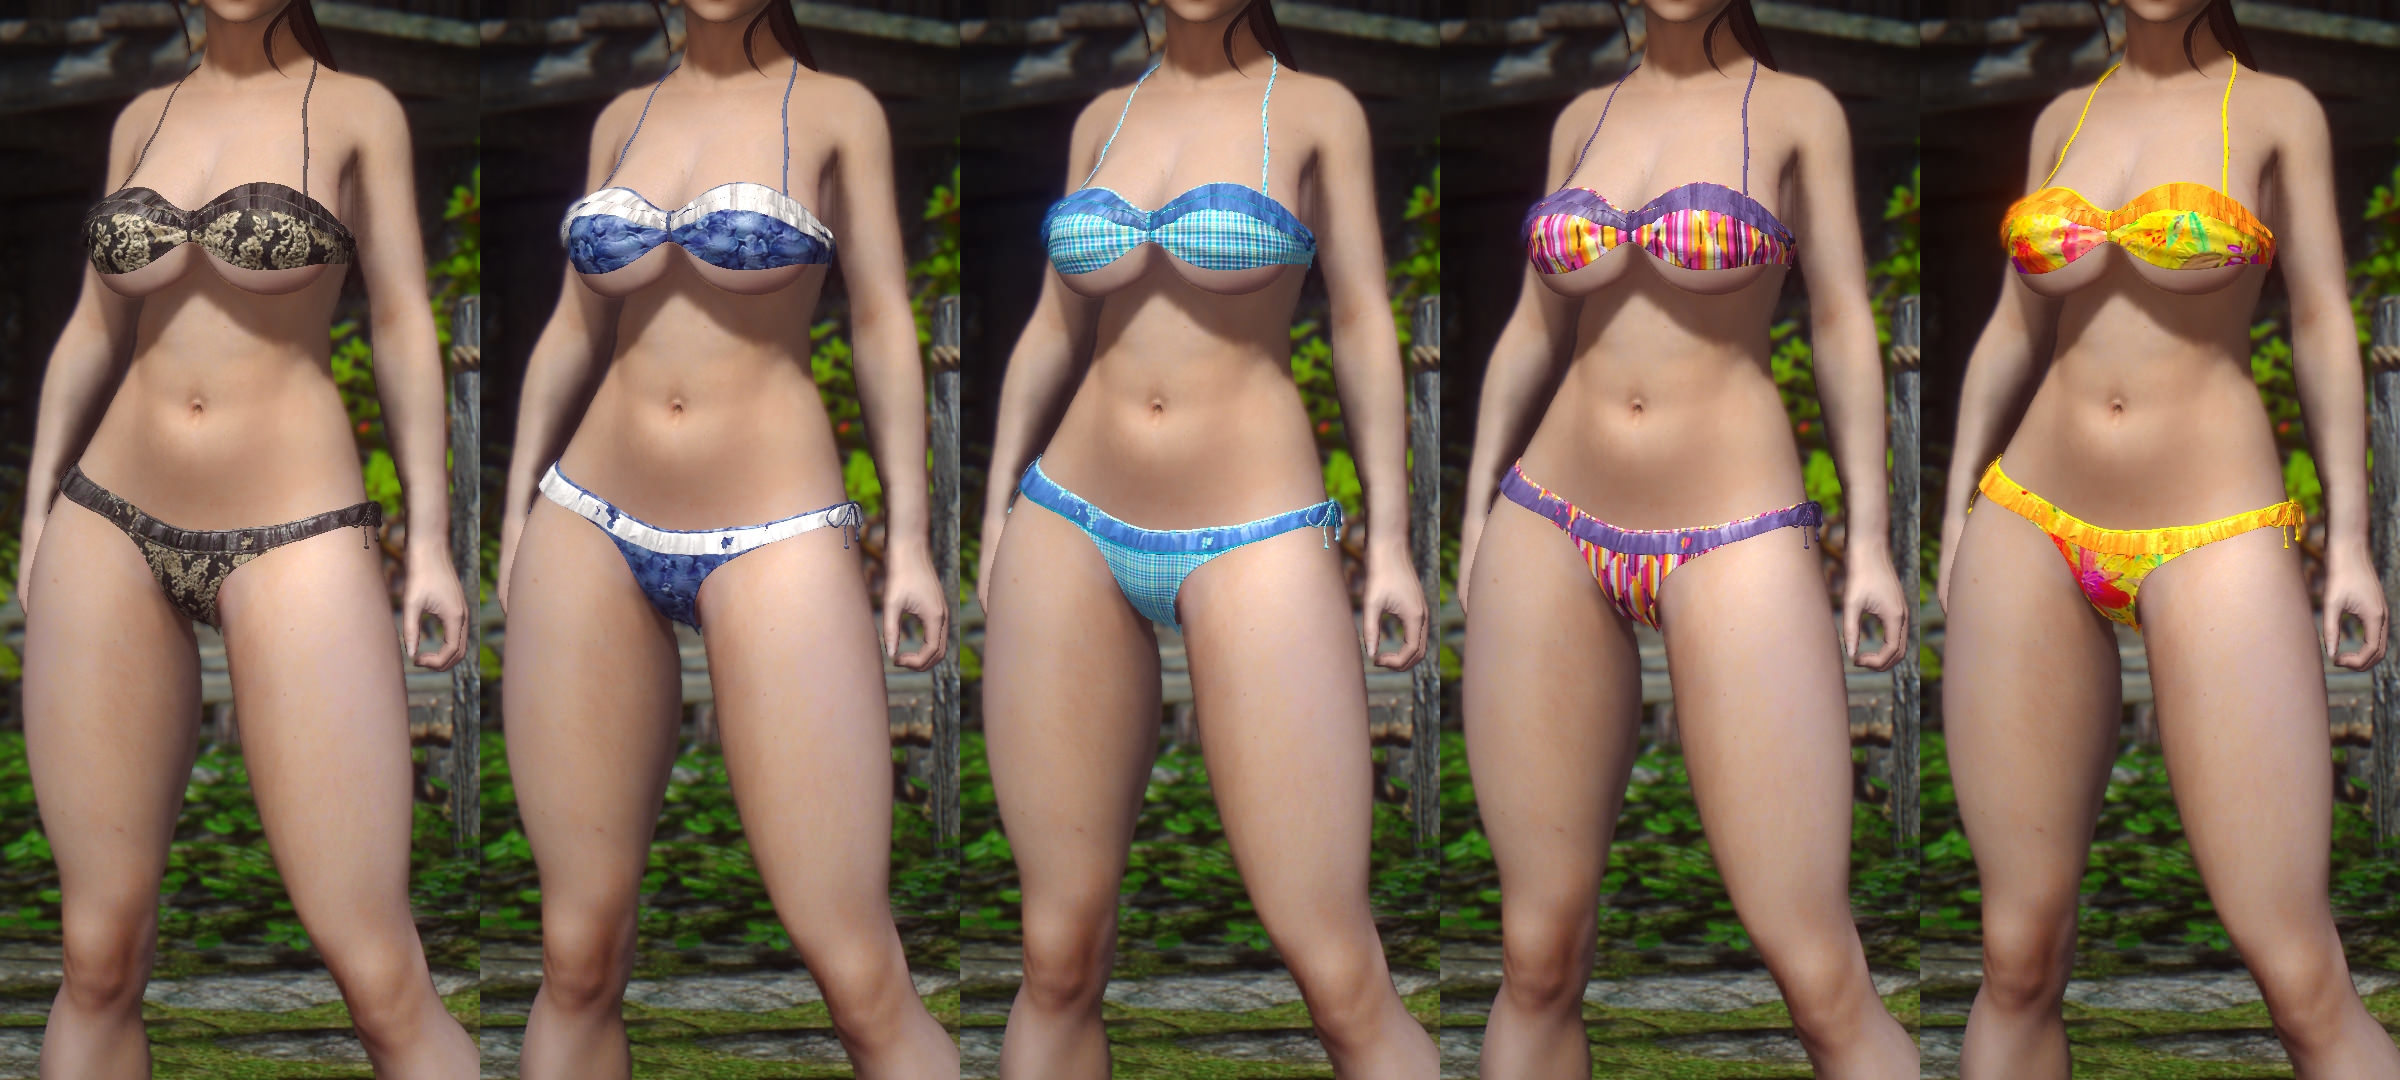 Daz_Bikini_Collection_2_7BO_13.jpg